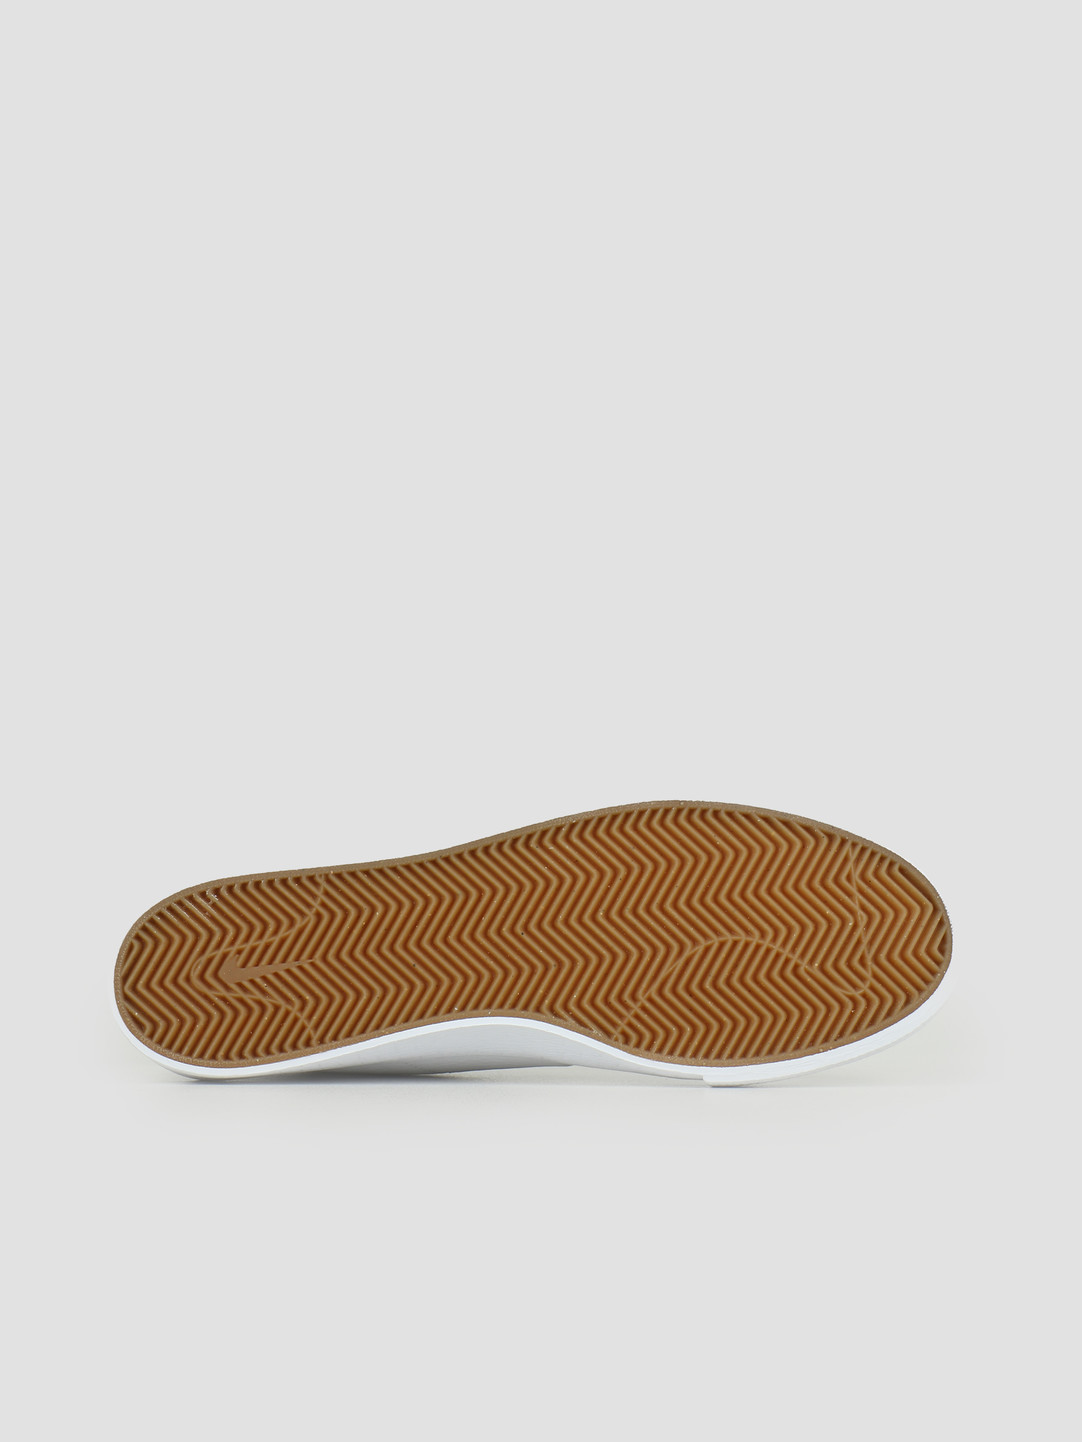 Nike Nike SB Zoom Bruin White Team Orange White Gum Light Brown AQ7941-101